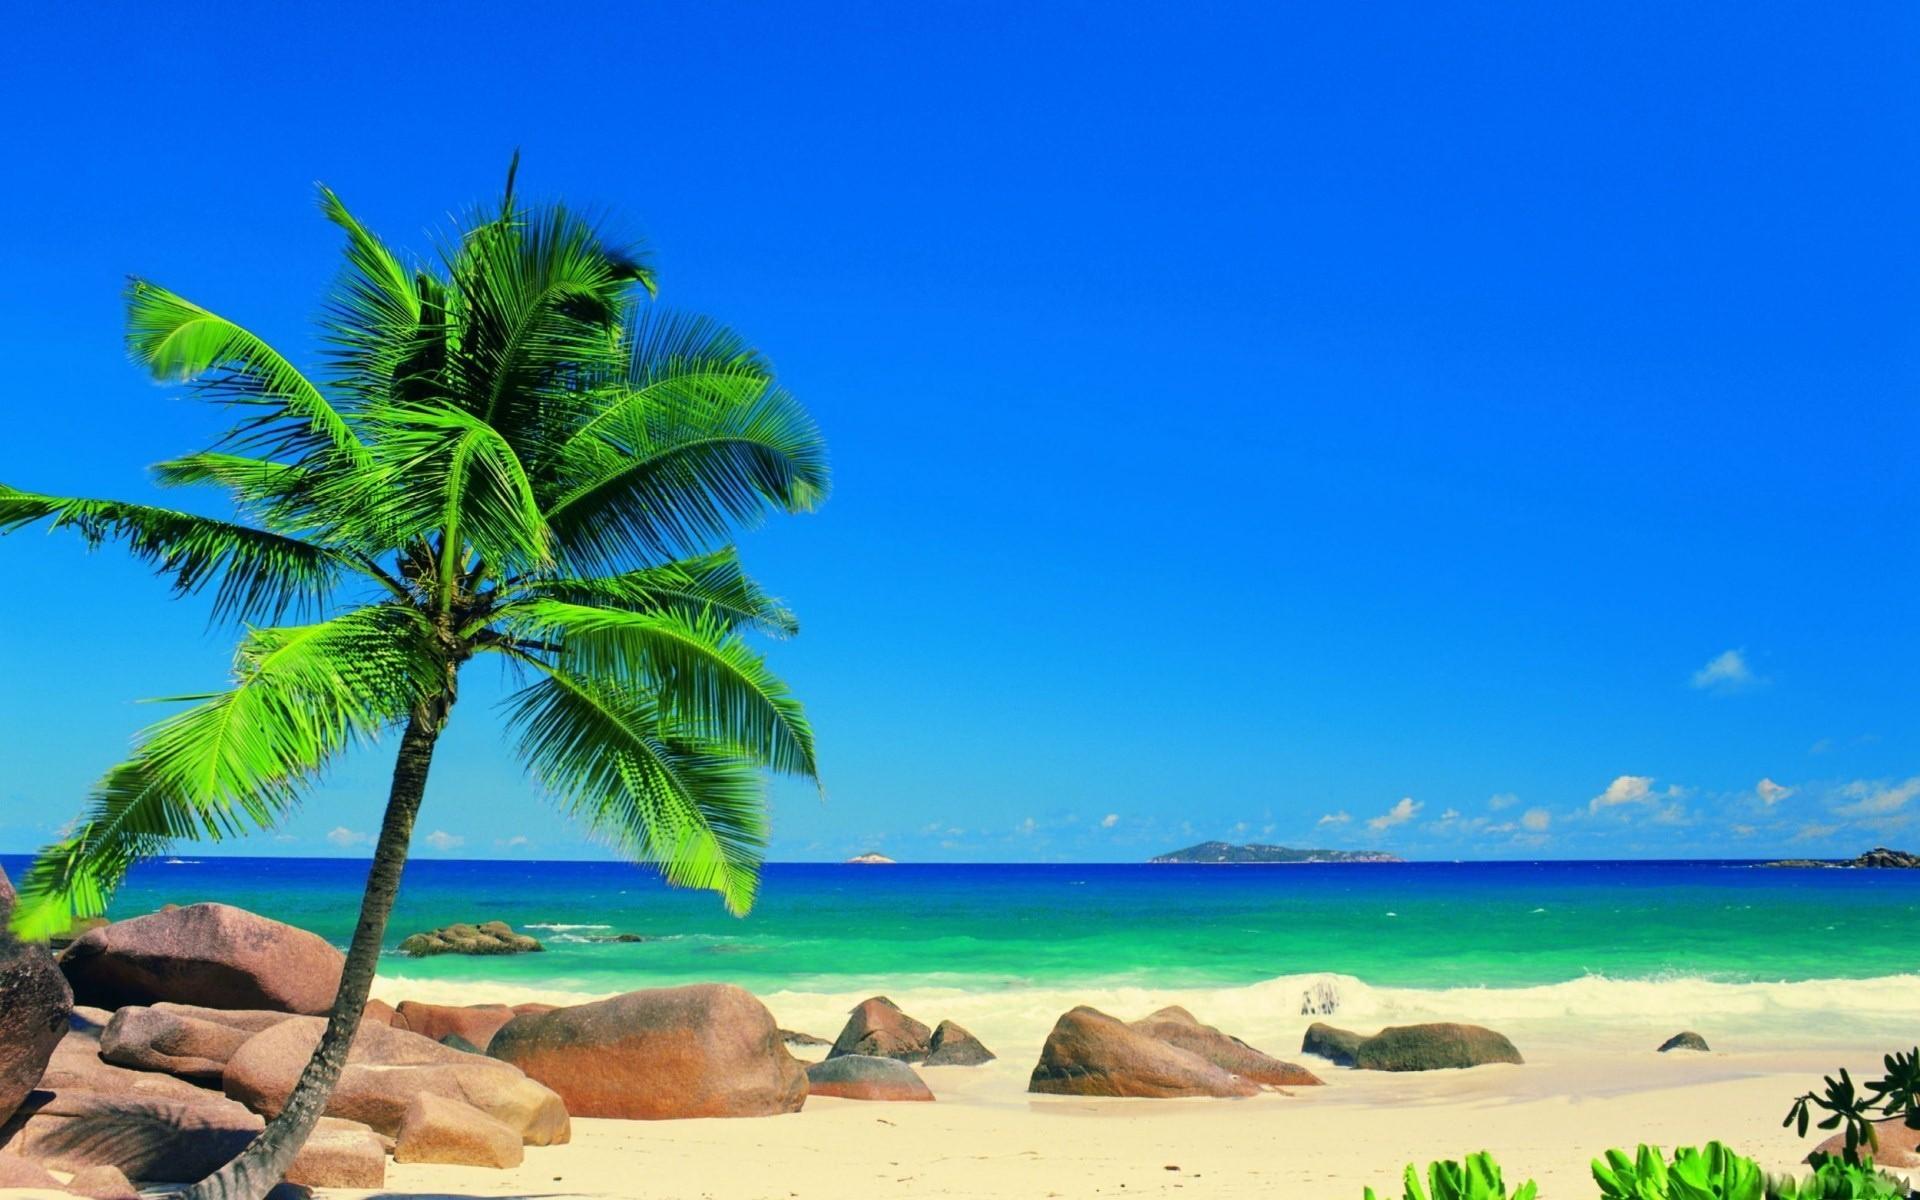 Beautiful-Beach-Backgrounds-Palm-Trees-High-Definition-Wallpapers-7ual.com_  – Guru Travel